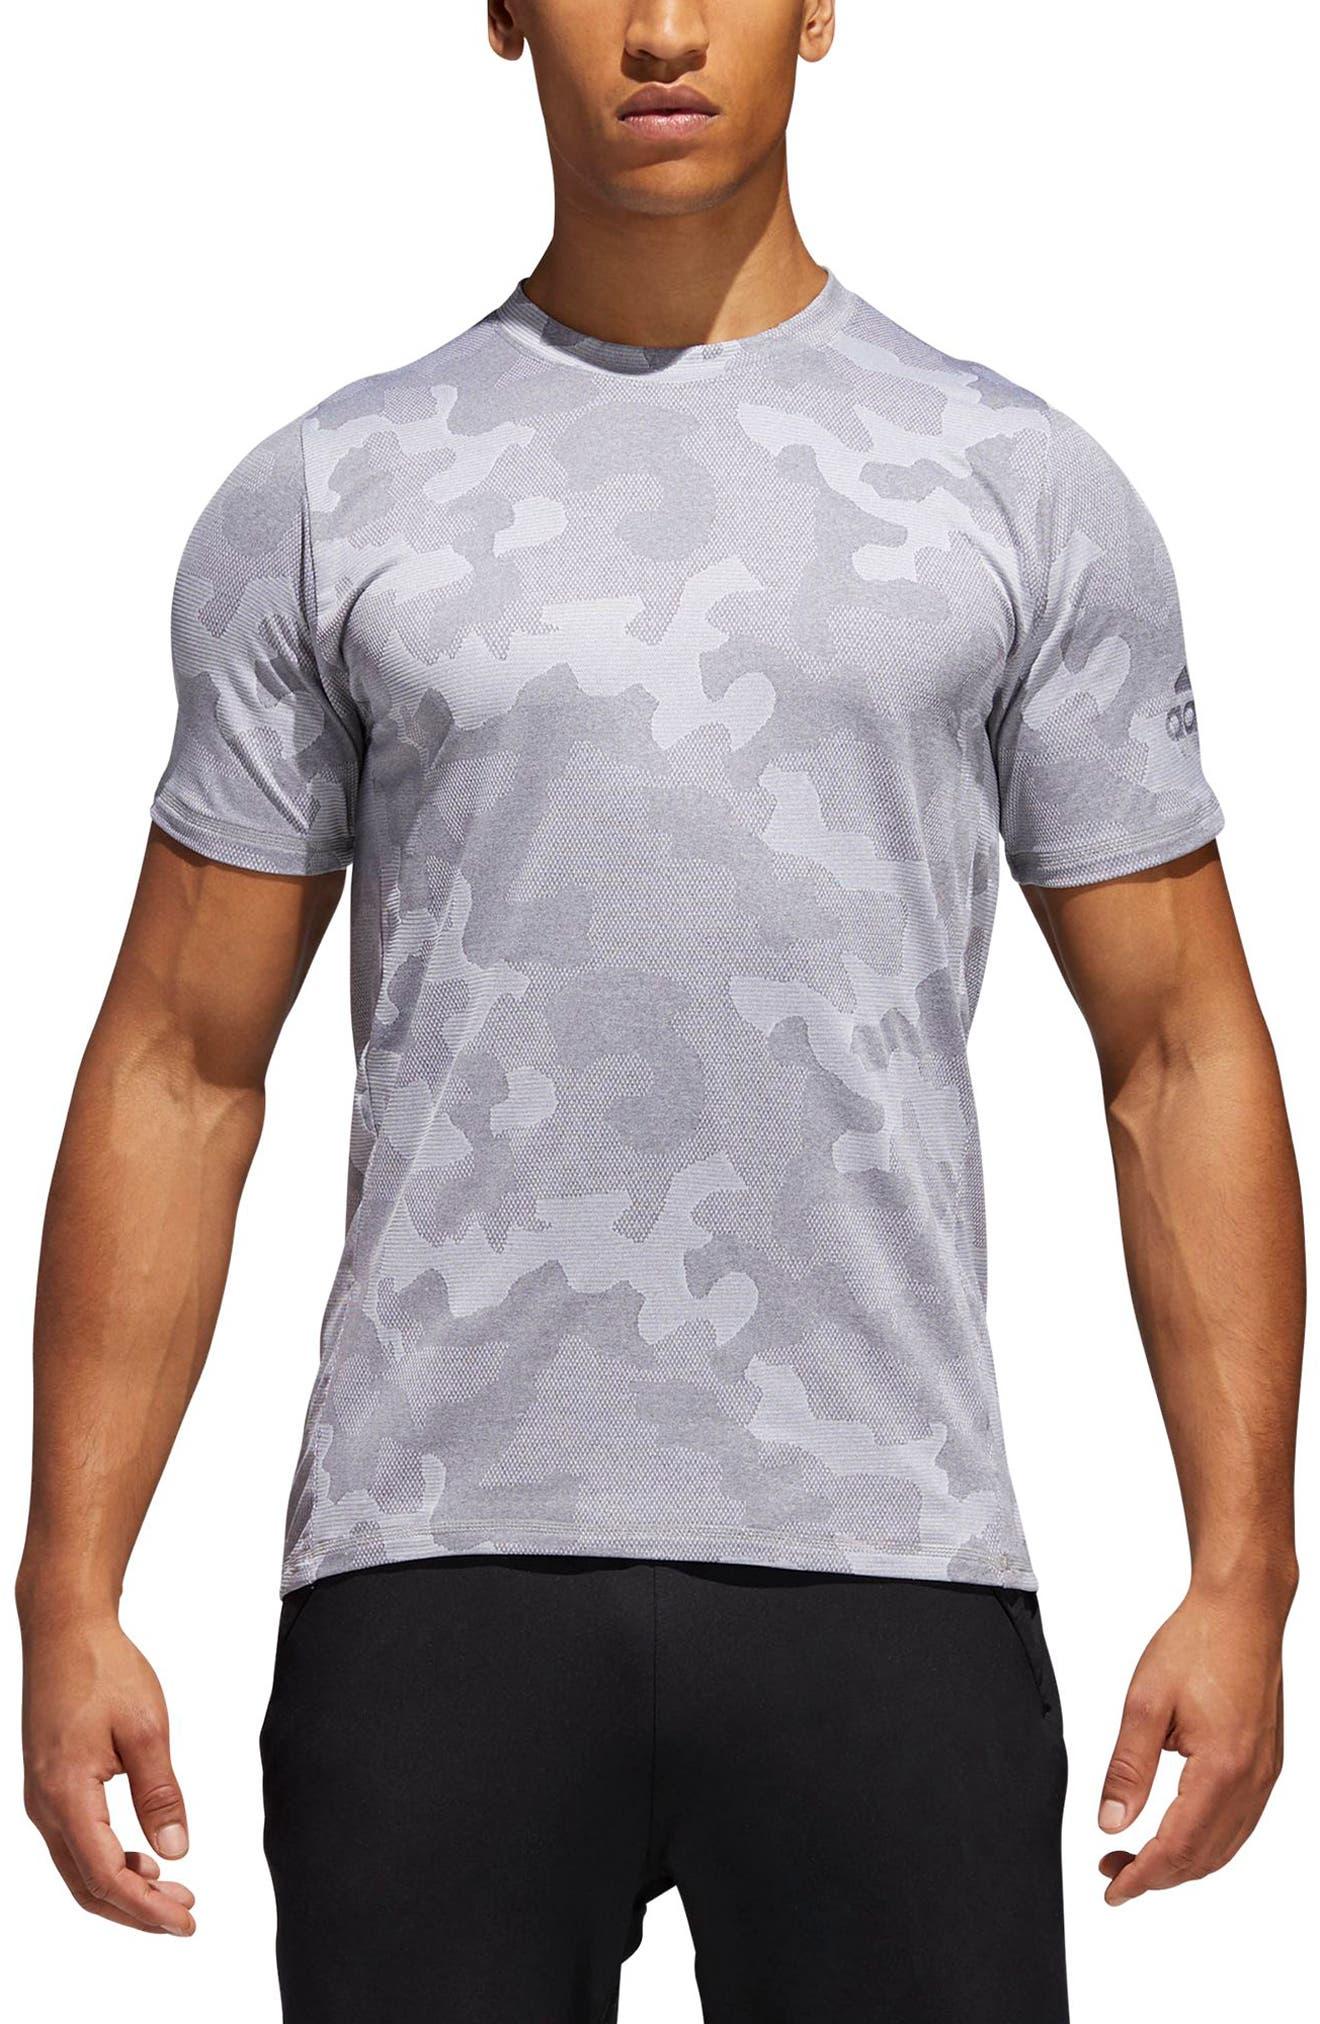 Camo Hype T-Shirt,                             Main thumbnail 1, color,                             Grey Three / White